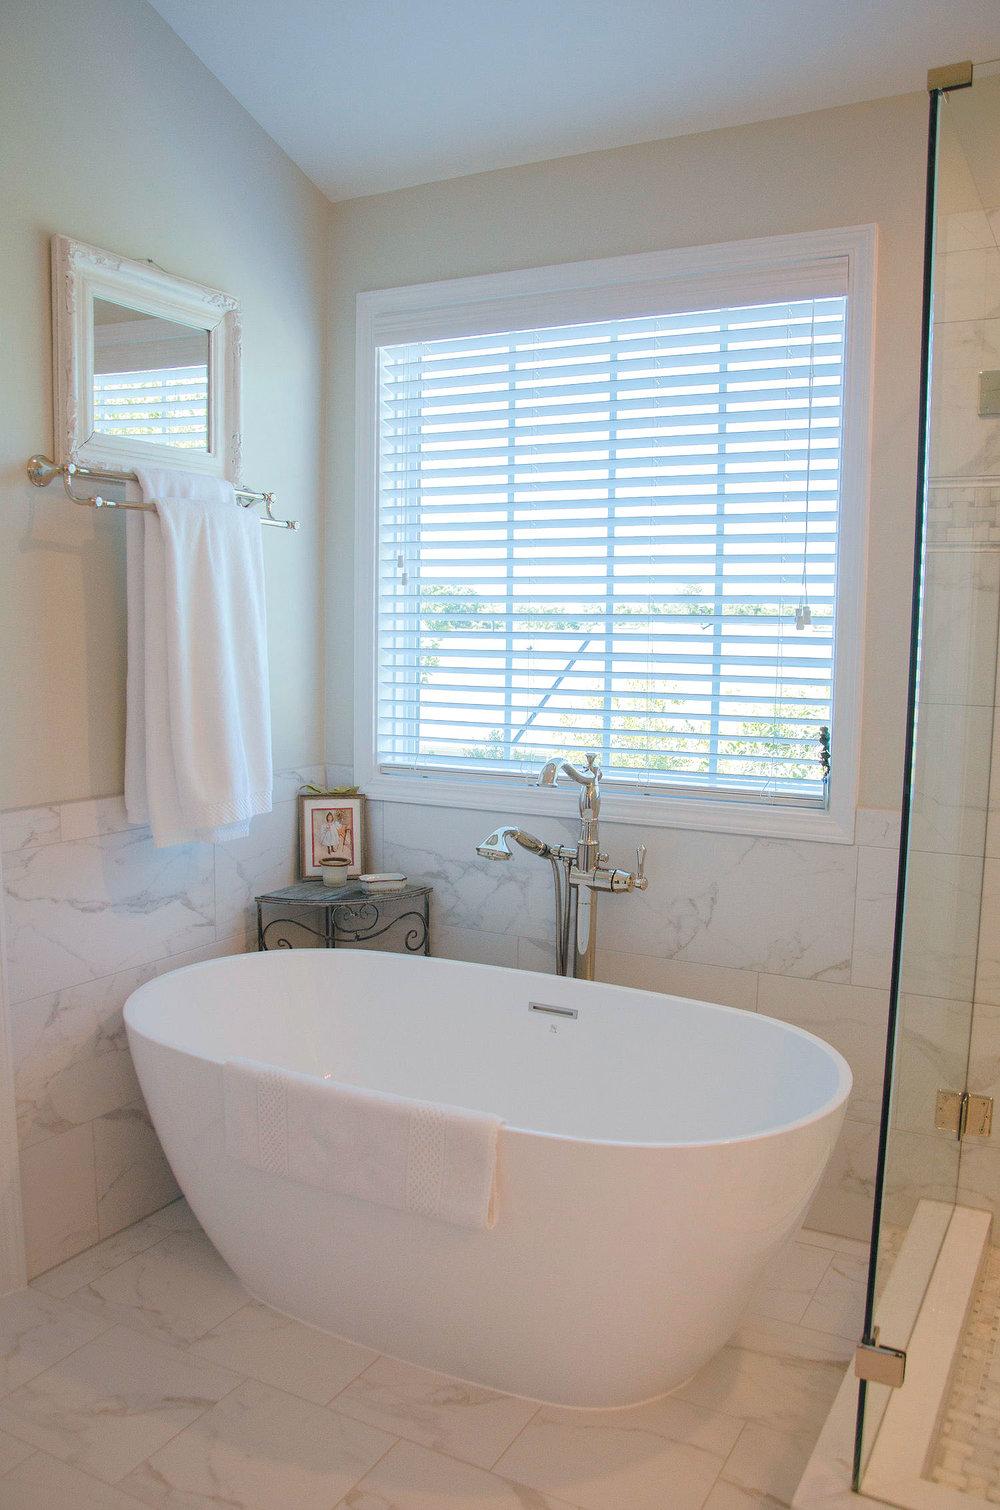 Photo courtesy of dream home design